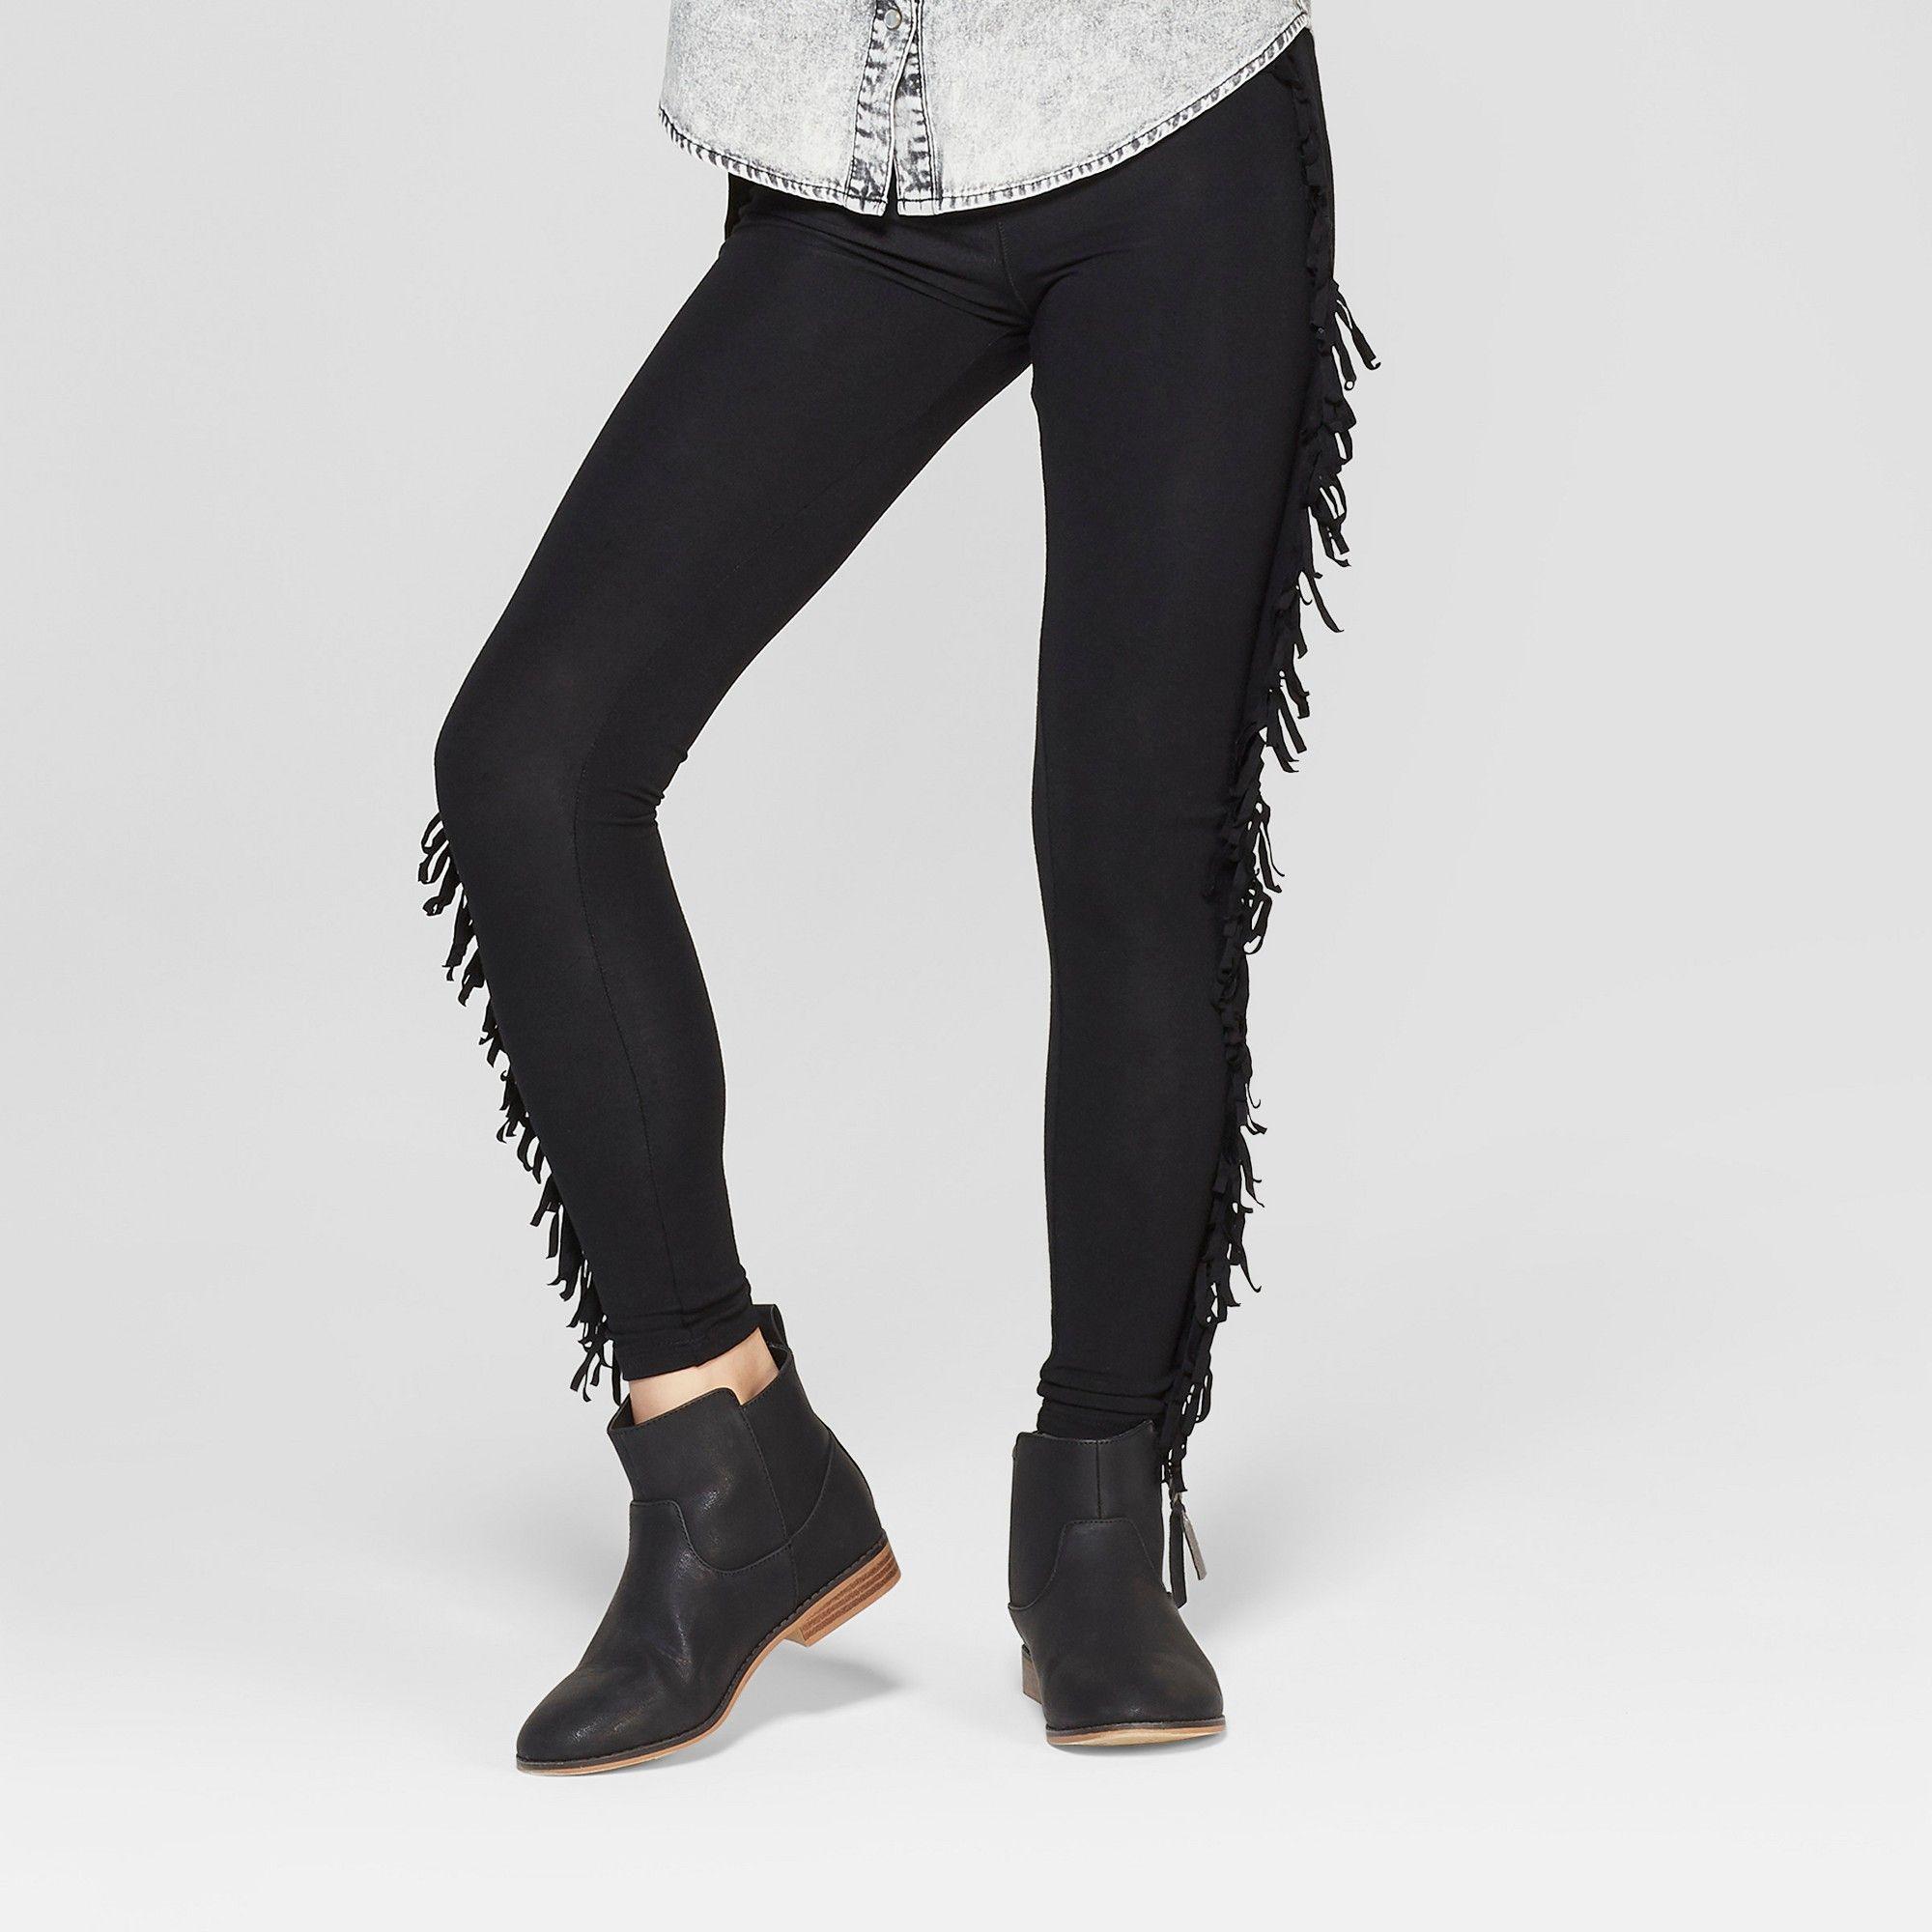 47ce76c338b4 Girls' Leggings with Fringe - art class Black Xxl